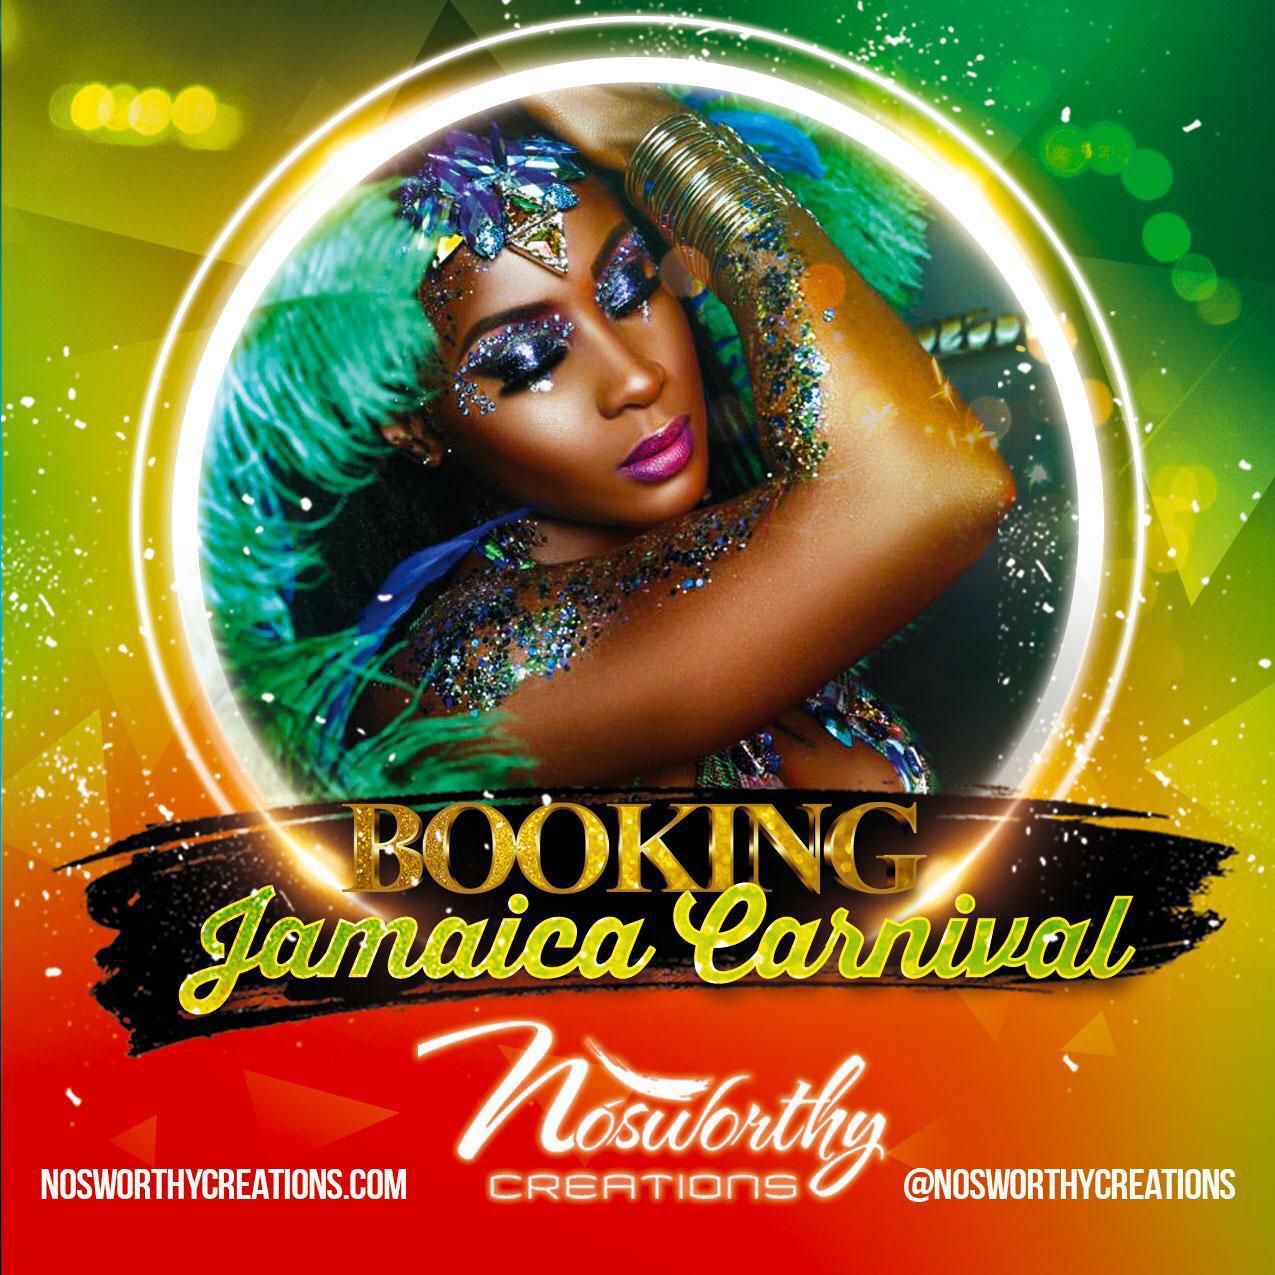 jamaica carnival 2020